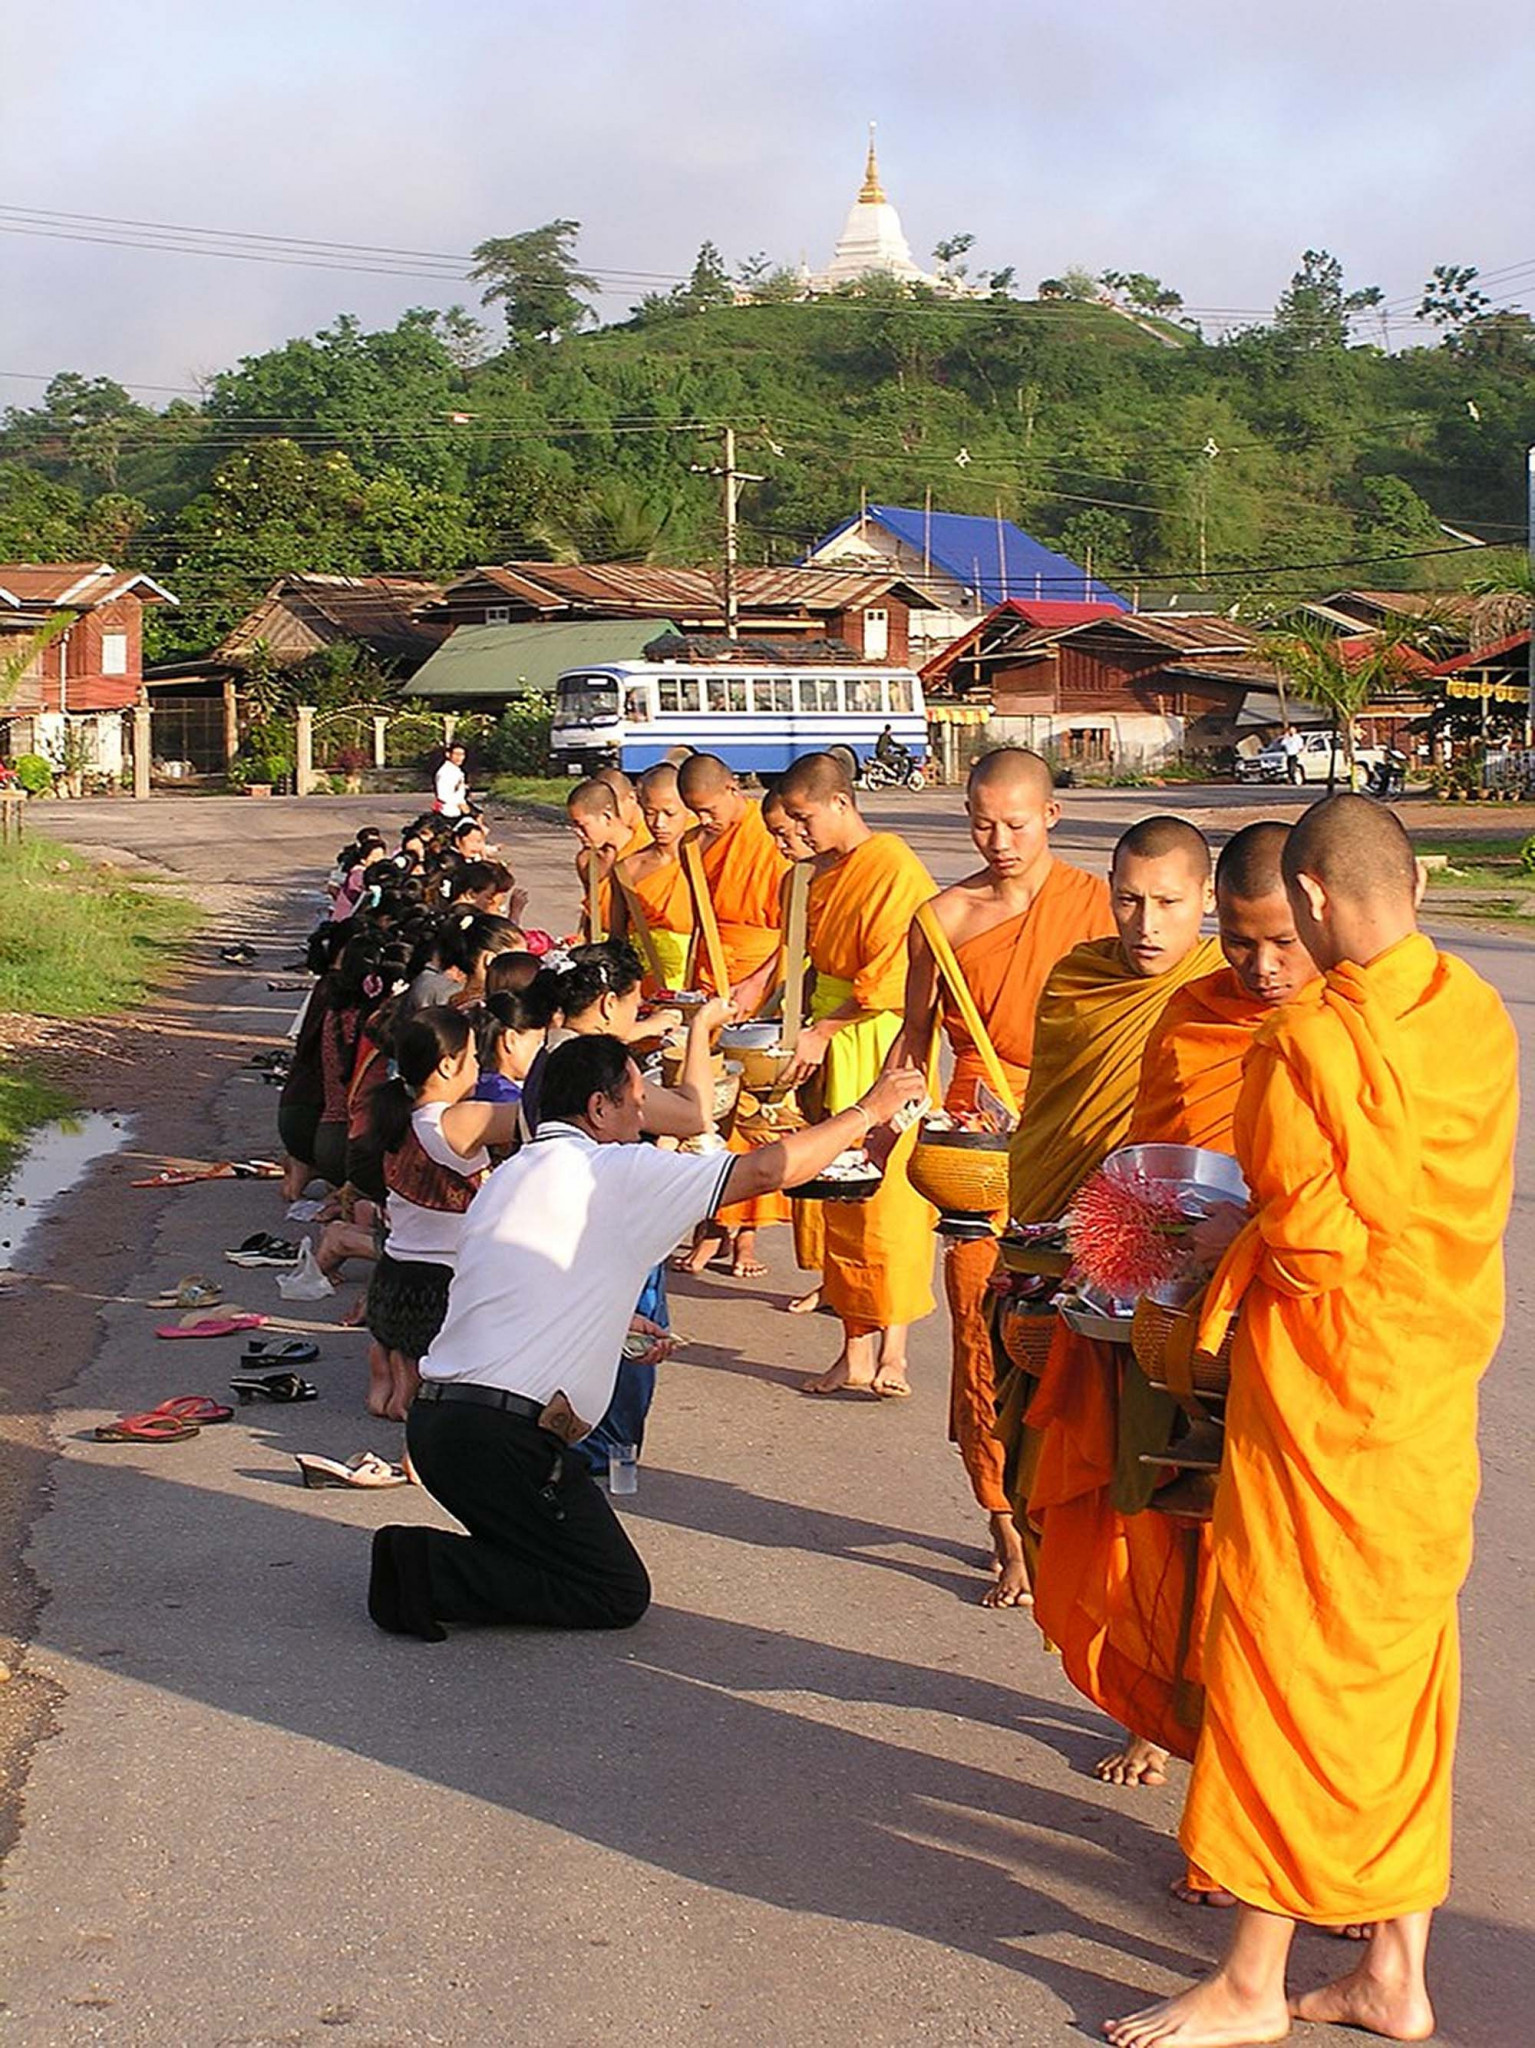 Monks receiving alms, Phou That temple, Laos